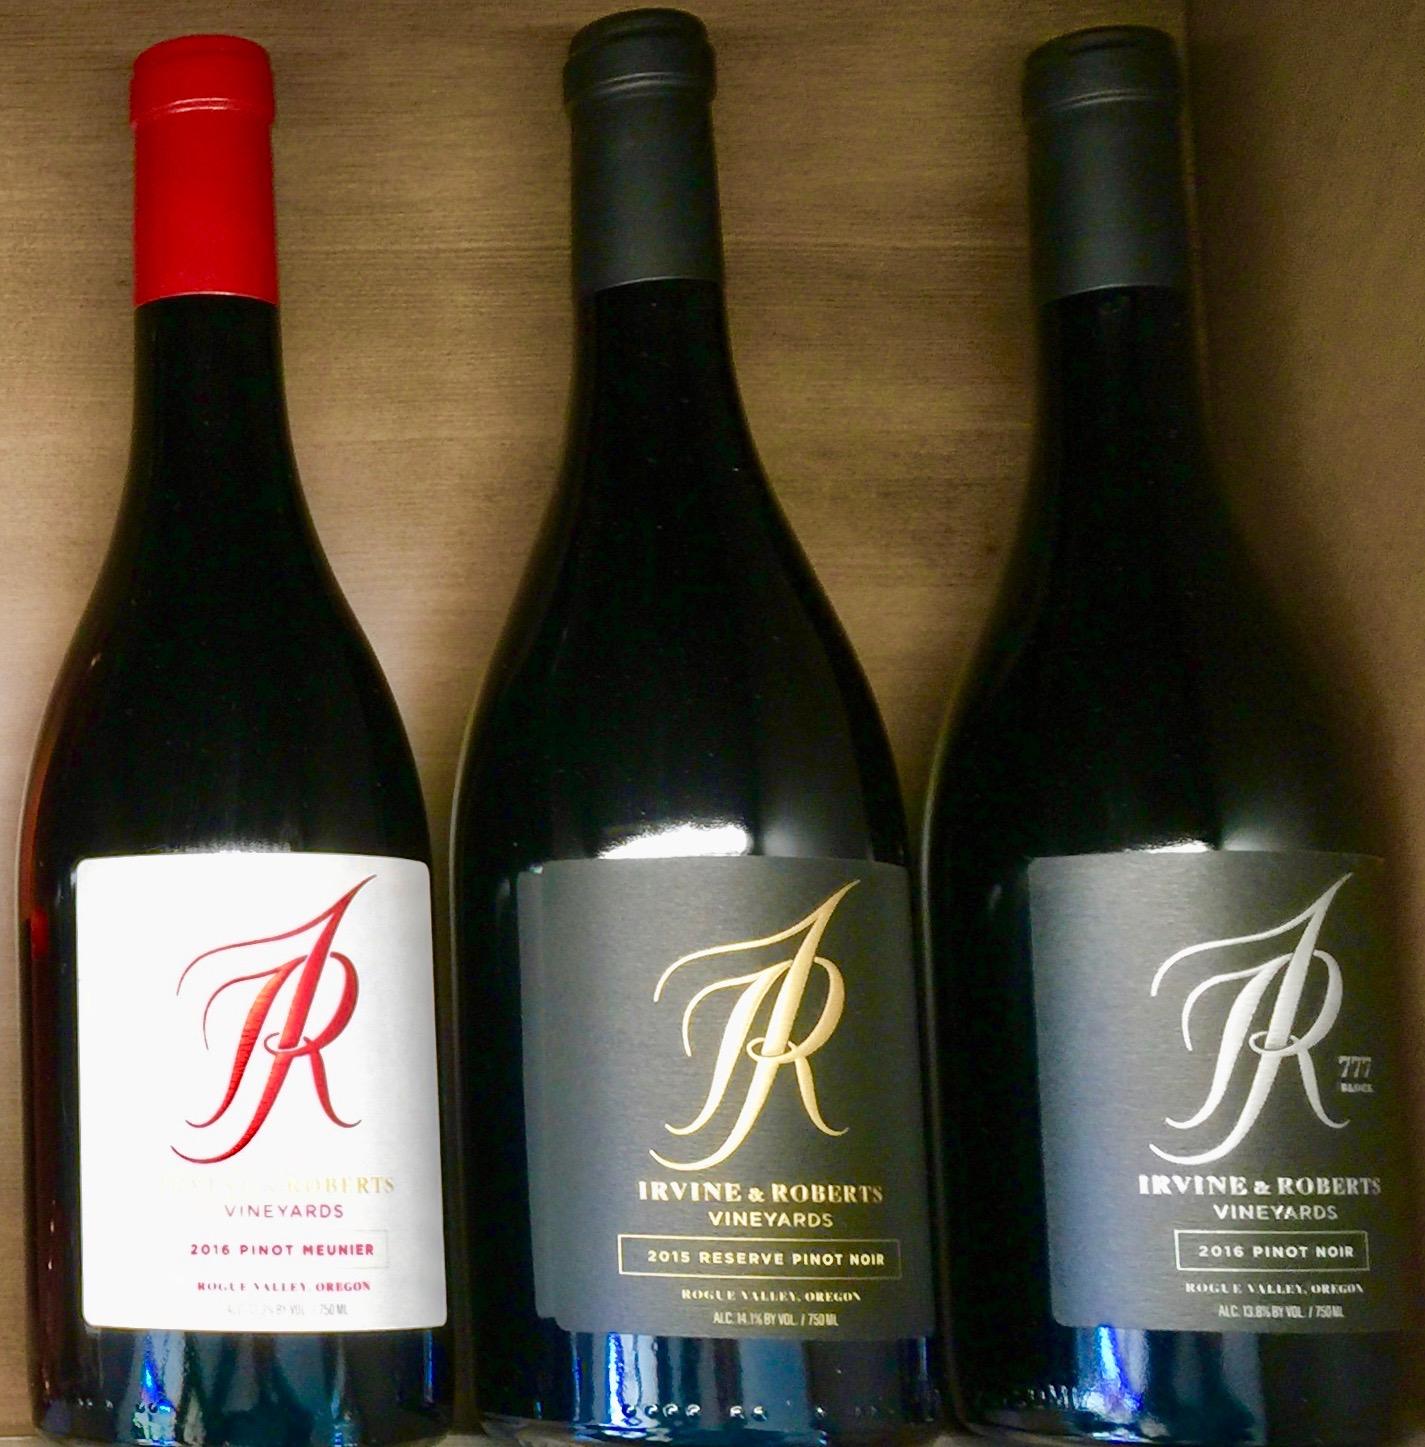 Tasting the Wines of Irvine & Roberts - TableConversation com